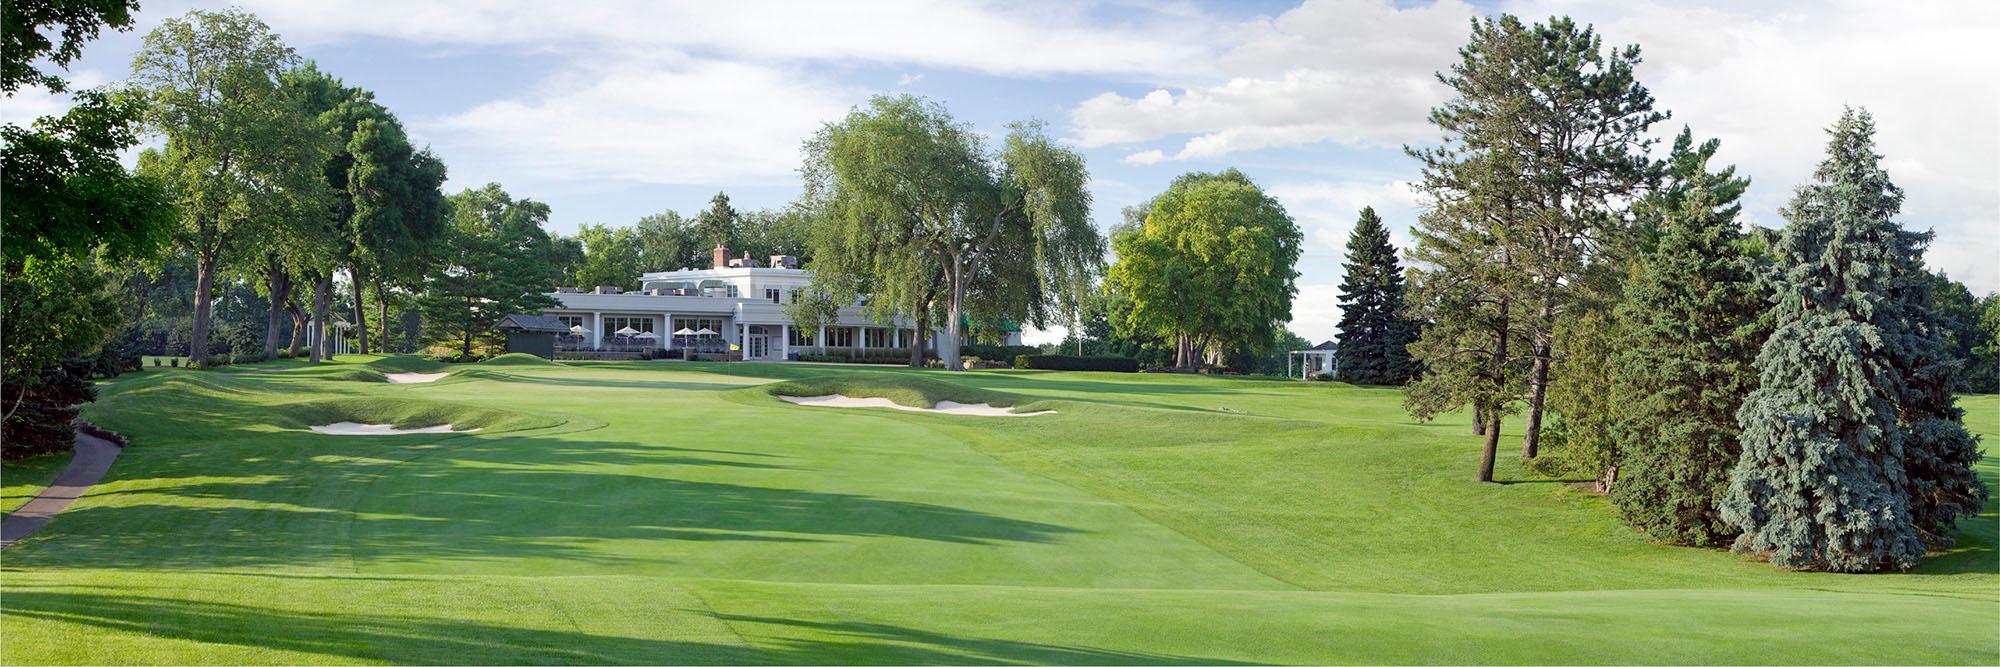 Golf Course Image - Minneapolis Golf Club No. 18